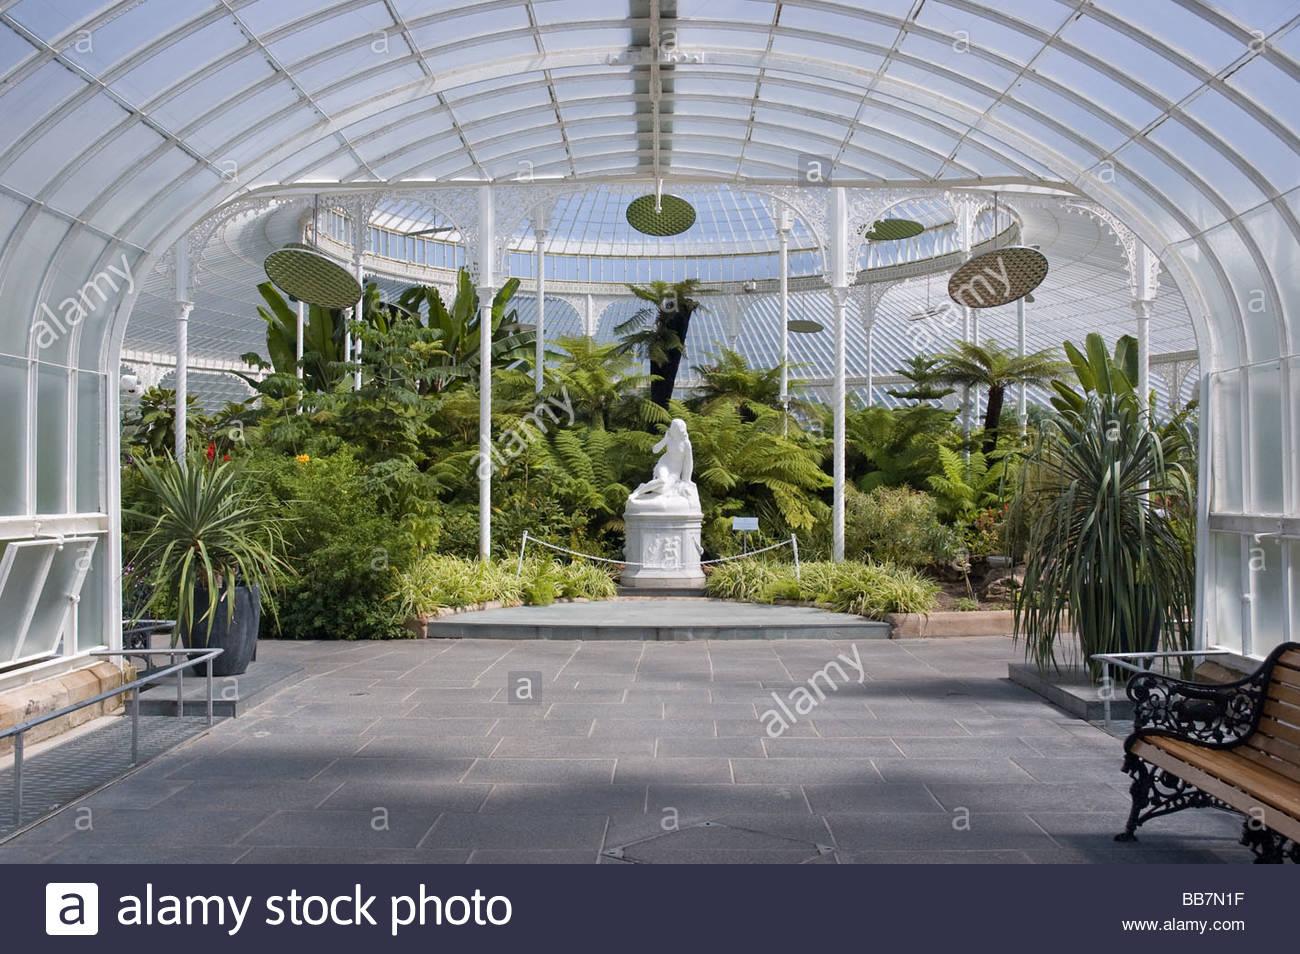 Interior View Of Glasgow Botanic Gardens